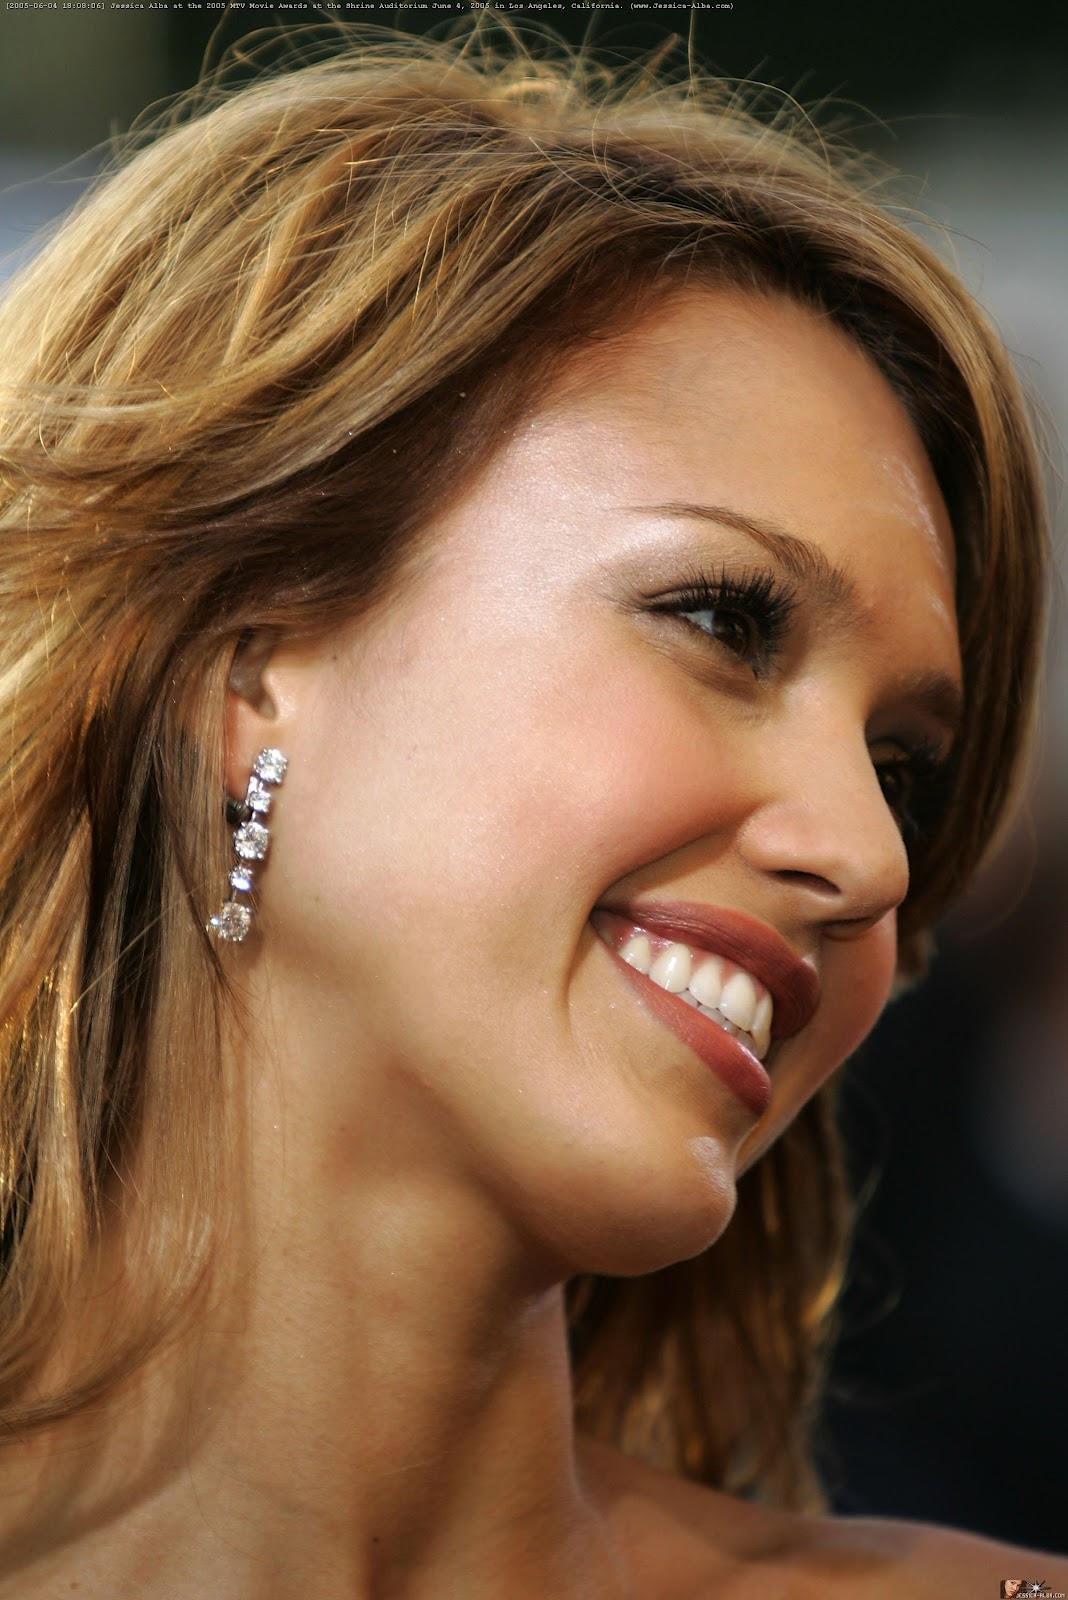 Popular Stars Beautiful Smiling Star Jessica Alba-7896